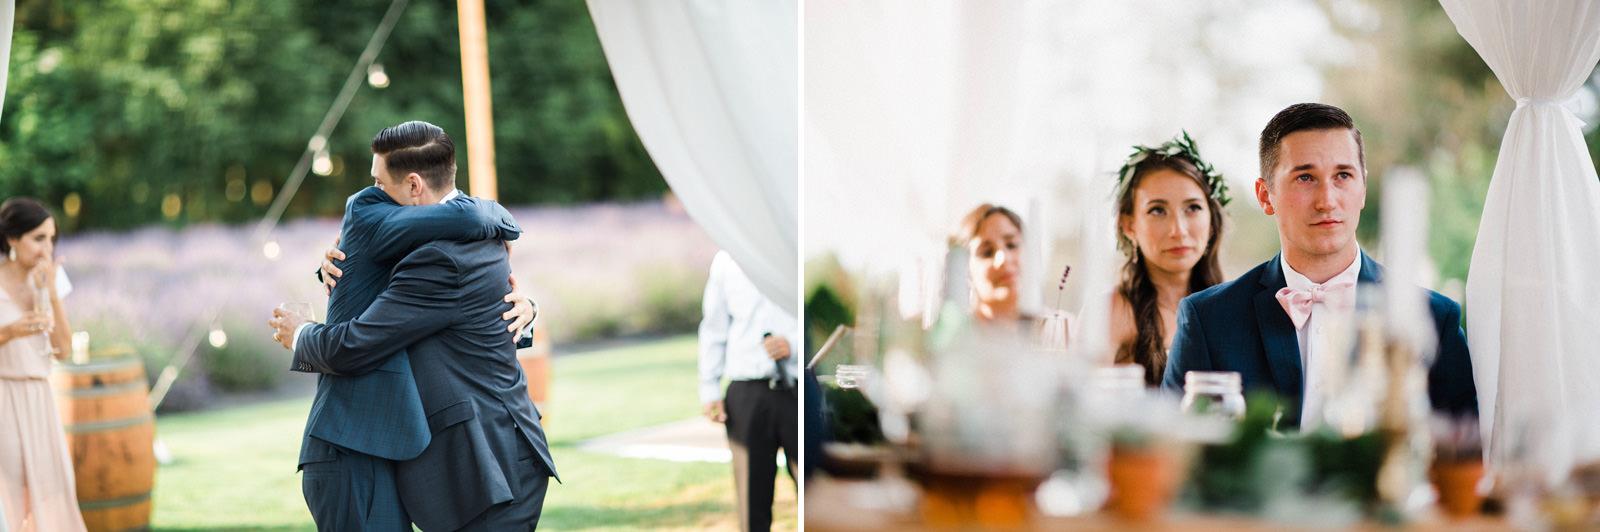 064-woodinville-lavendar-farm-wedding-with-golden-glowy-photos.jpg